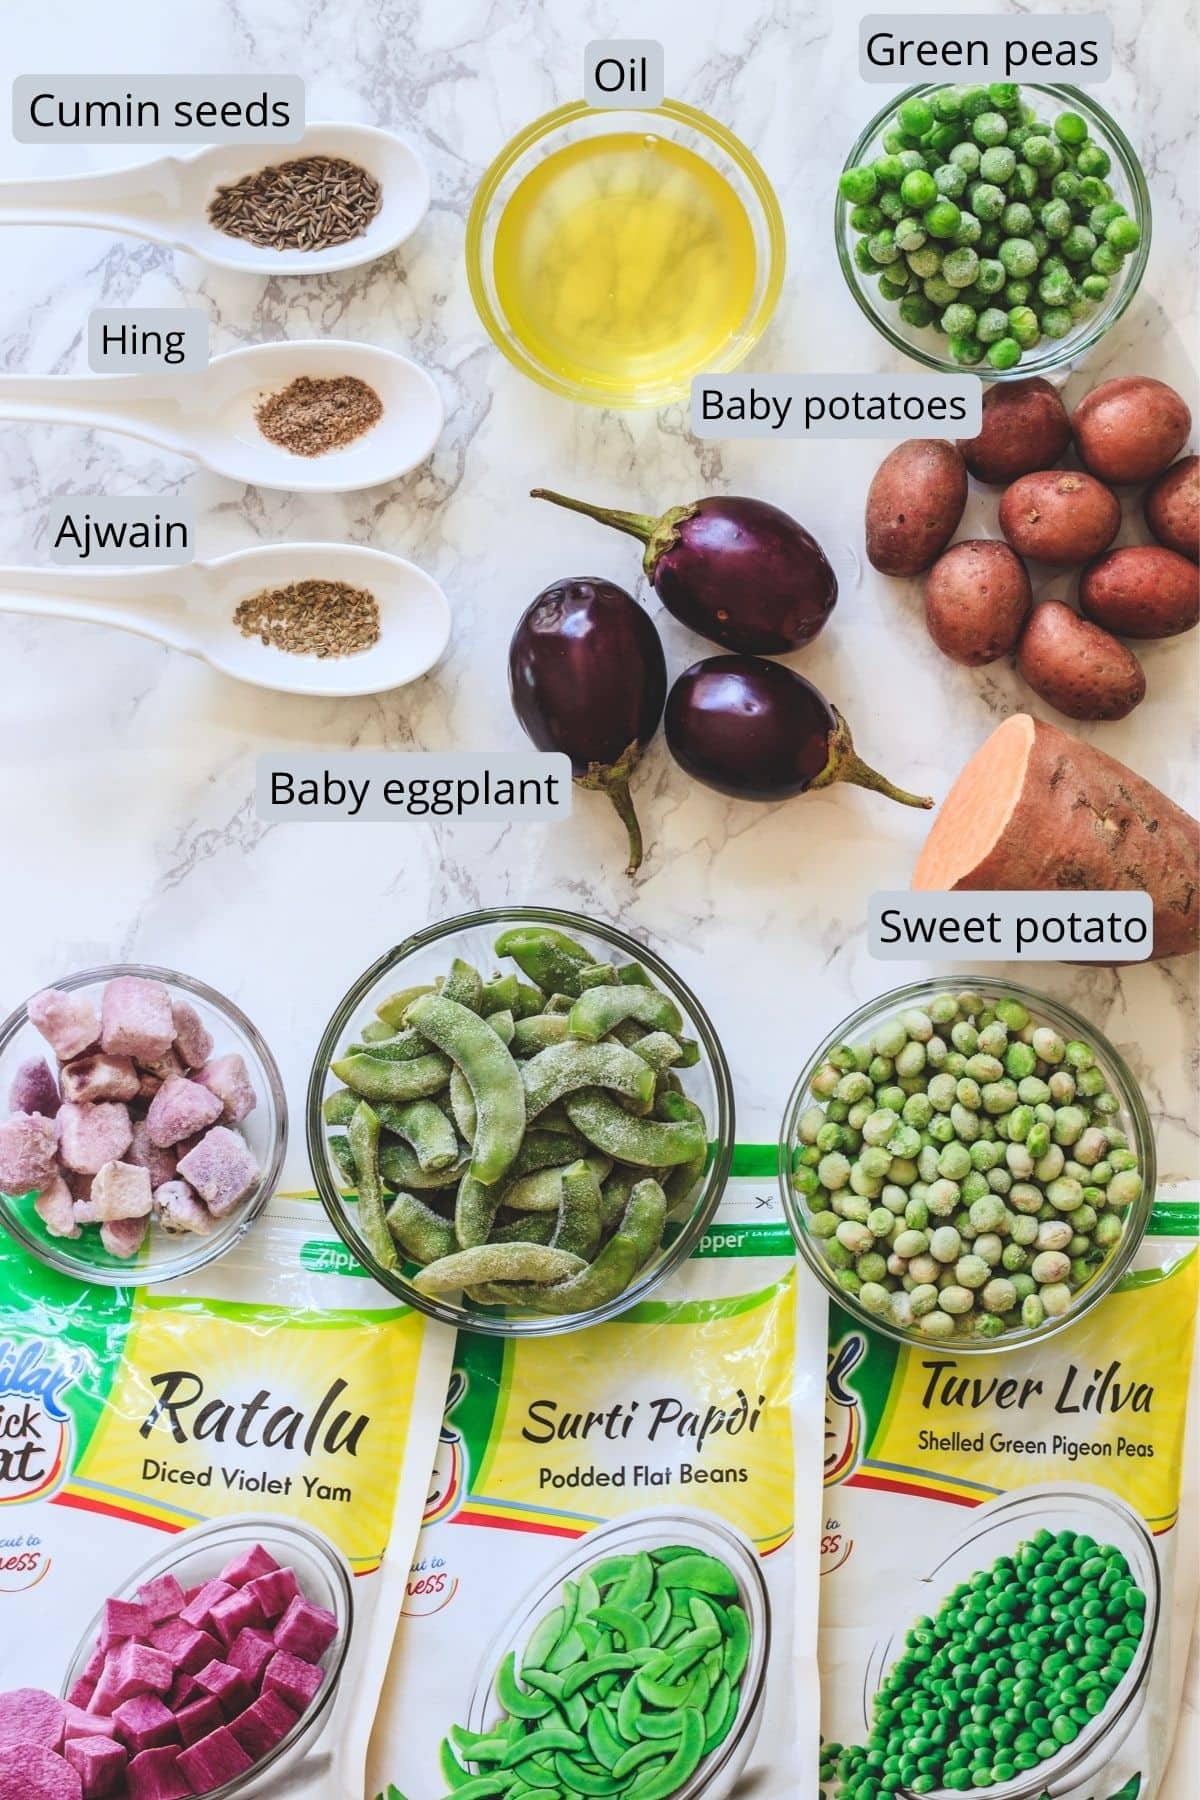 Ingredients used in undhiyu includes oil, cumin, ajwain, hing, peas, potato, sweet potato, eggplant, yam, papdi, lilva.